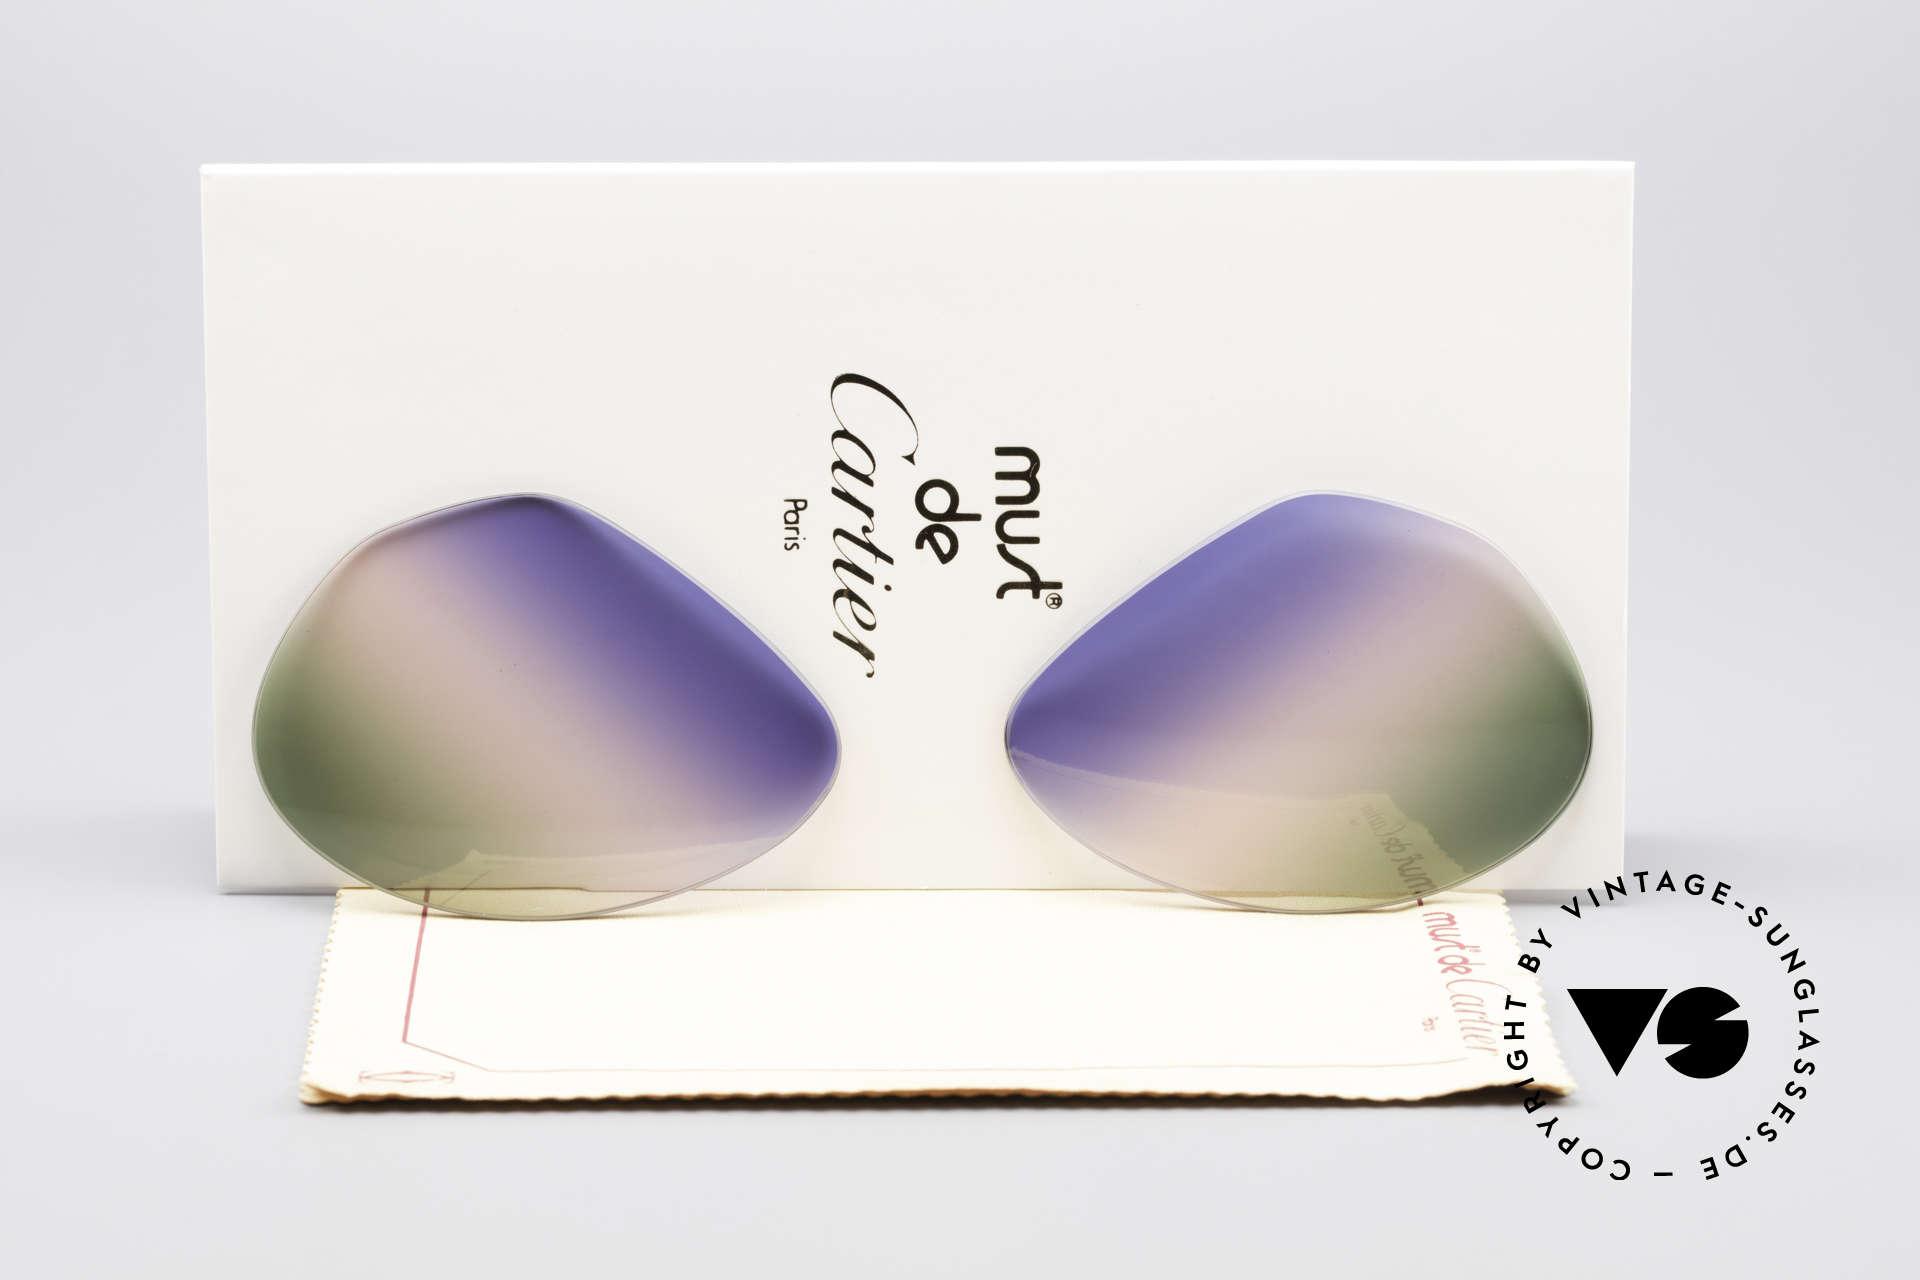 Cartier Vendome Lenses - L Tricolored Horizon Lenses, replacement lenses for Cartier mod. Vendome 62mm size, Made for Men and Women